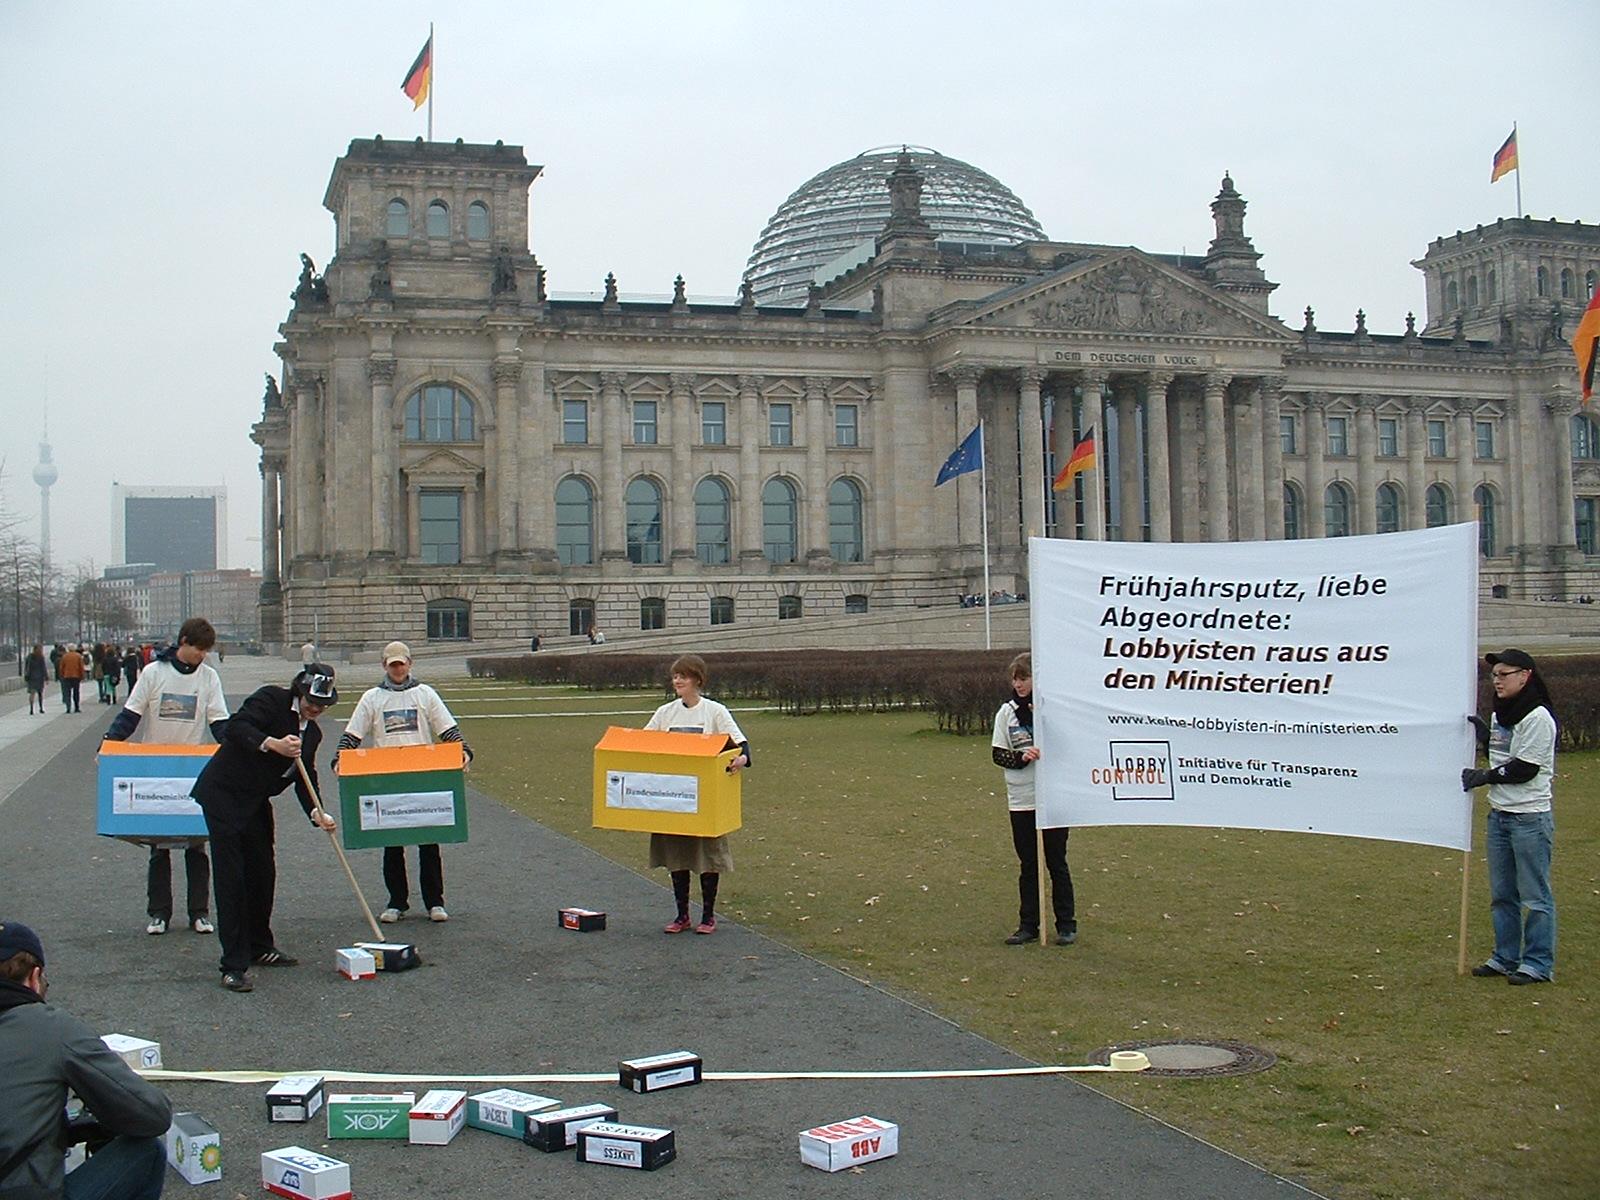 Aktion Frühjahrsputz gegen Lobbyisten in Ministerien 2008